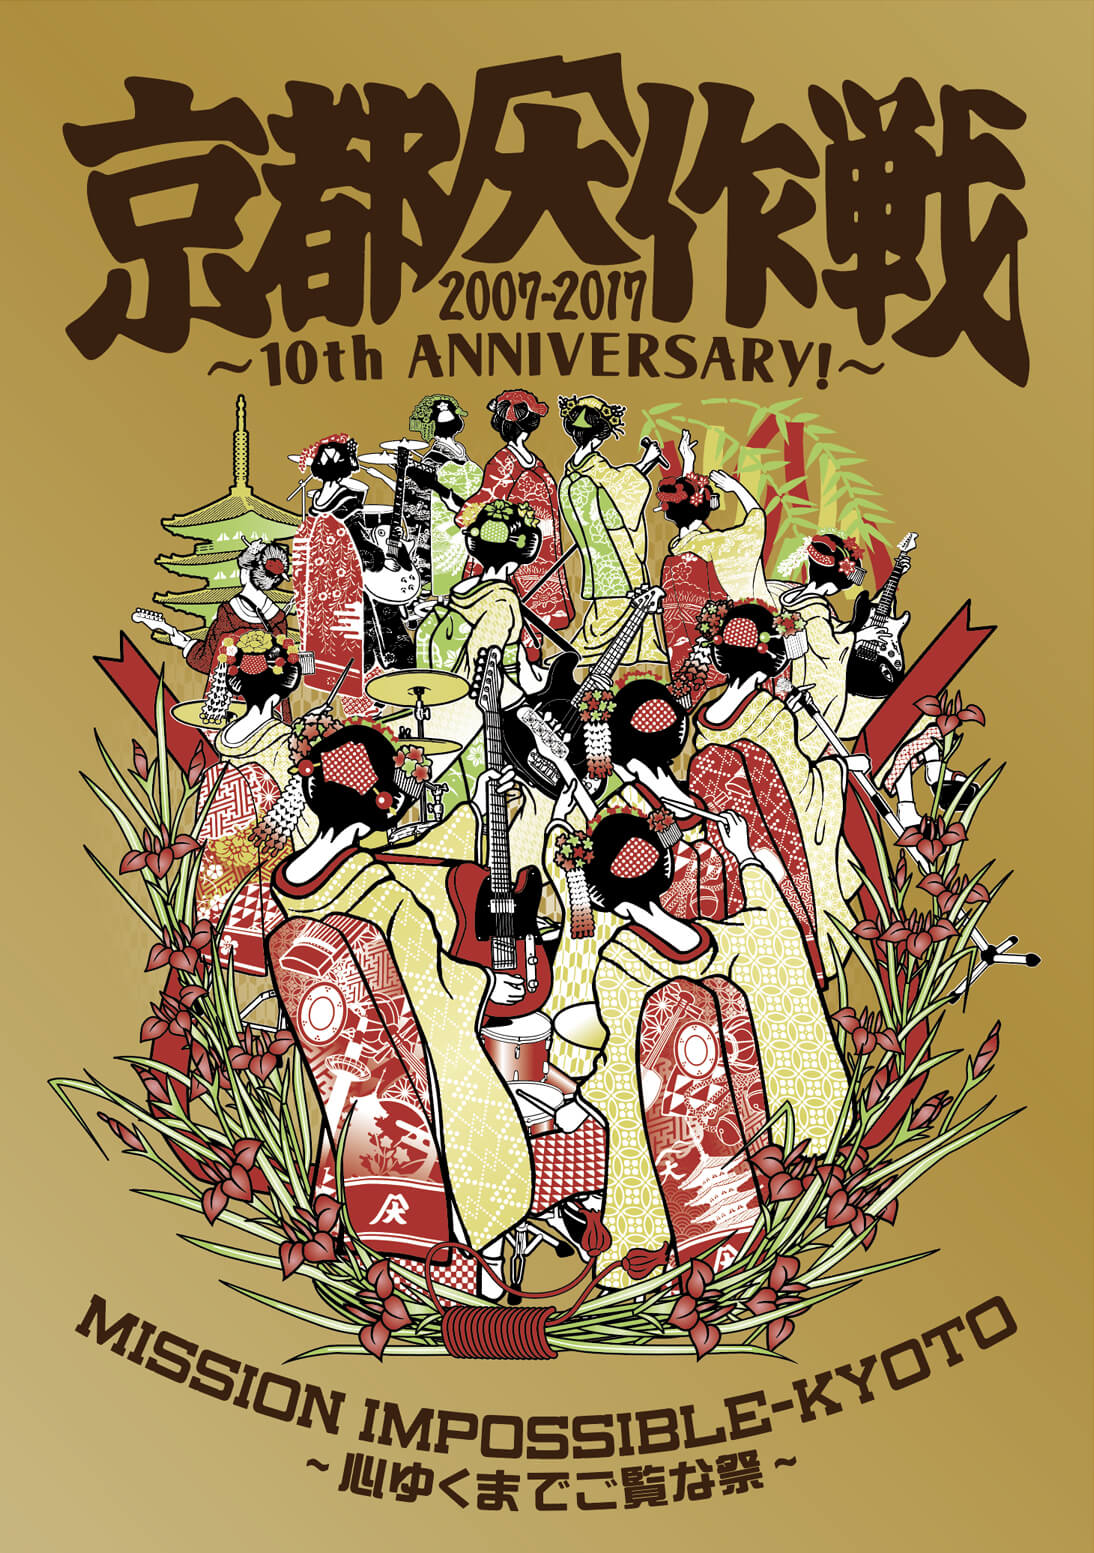 10-FEET主催イベント「京都大作戦」の10年分をまとめた映像作品の詳細発表サムネイル画像